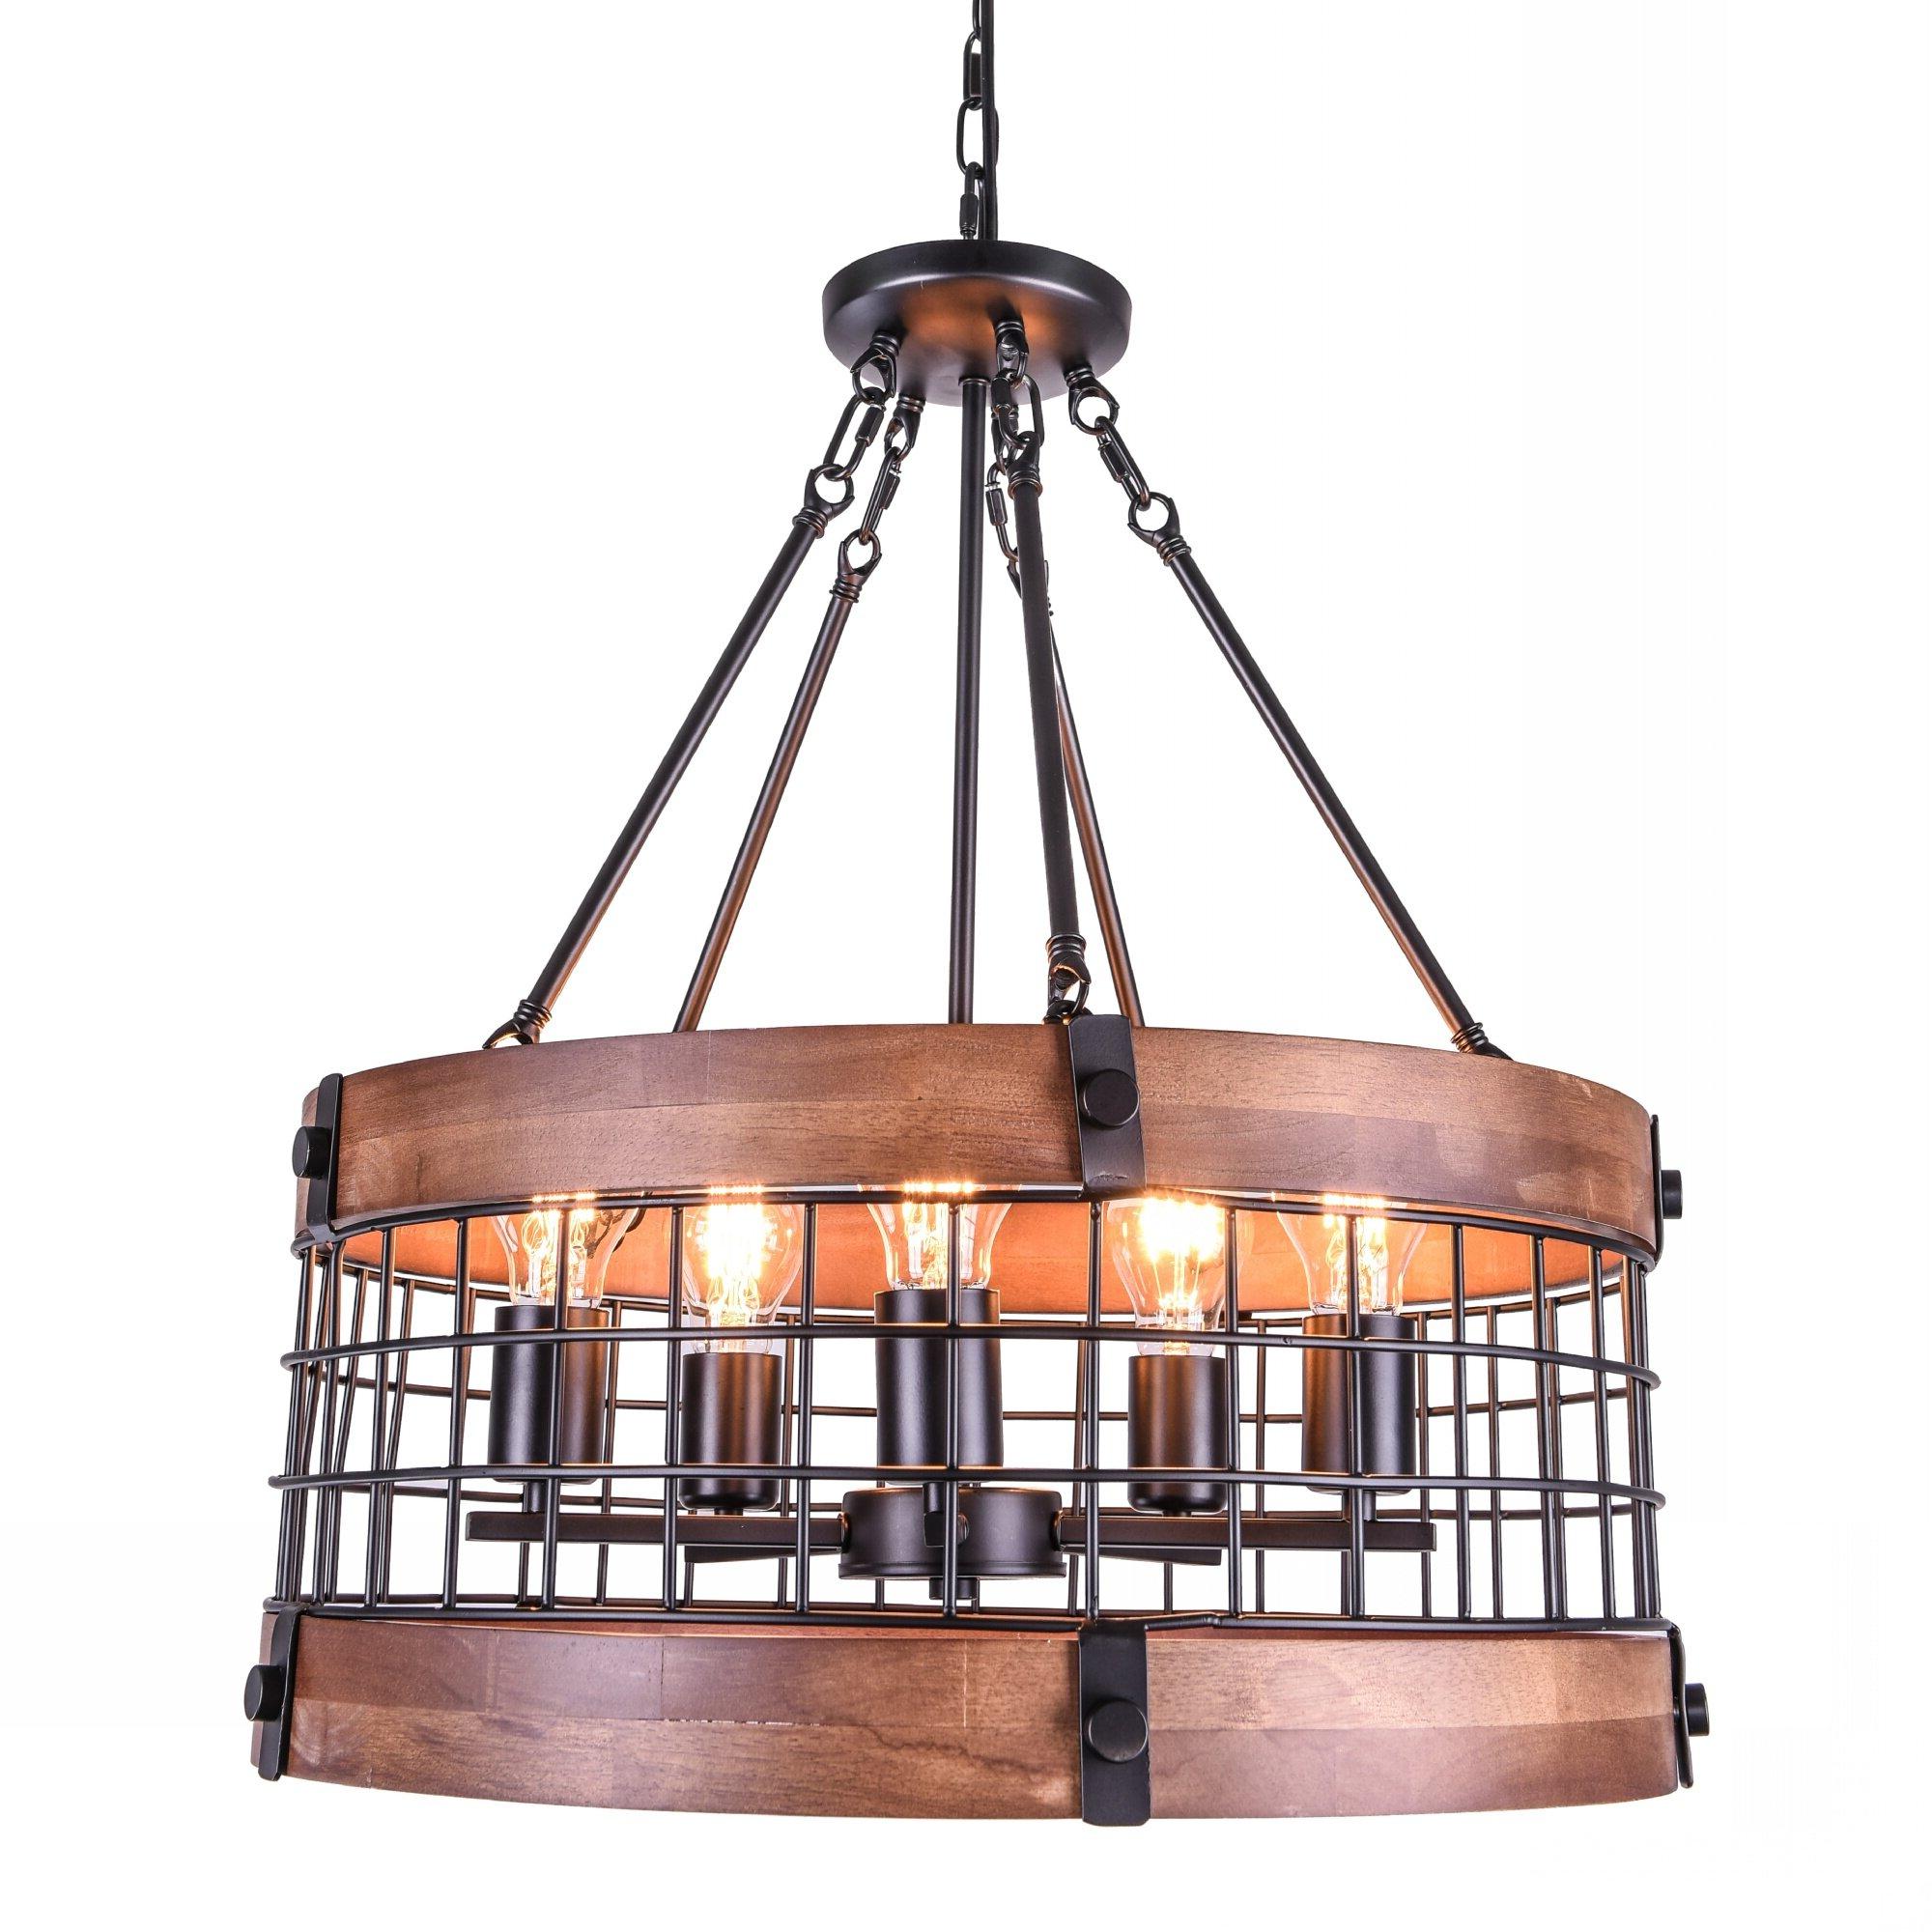 Fashionable Paterson 5 Light Drum Chandelier Within Abel 5 Light Drum Chandeliers (View 10 of 20)